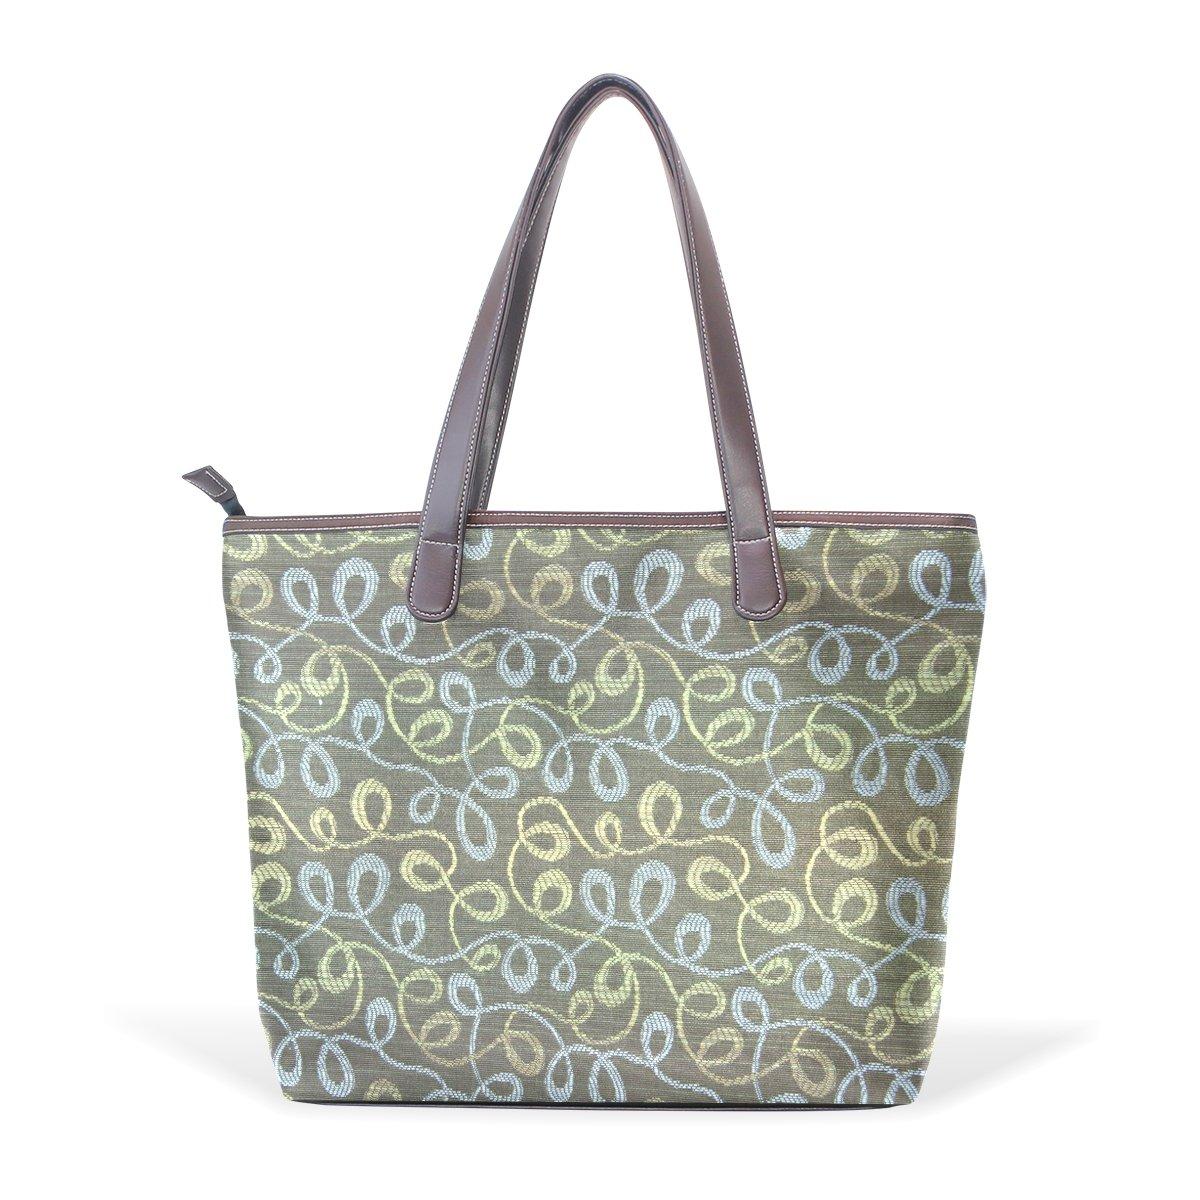 SCDS Retro Swirls 70S Brown PU Leather Lady Handbag Tote Bag Zipper Shoulder Bag